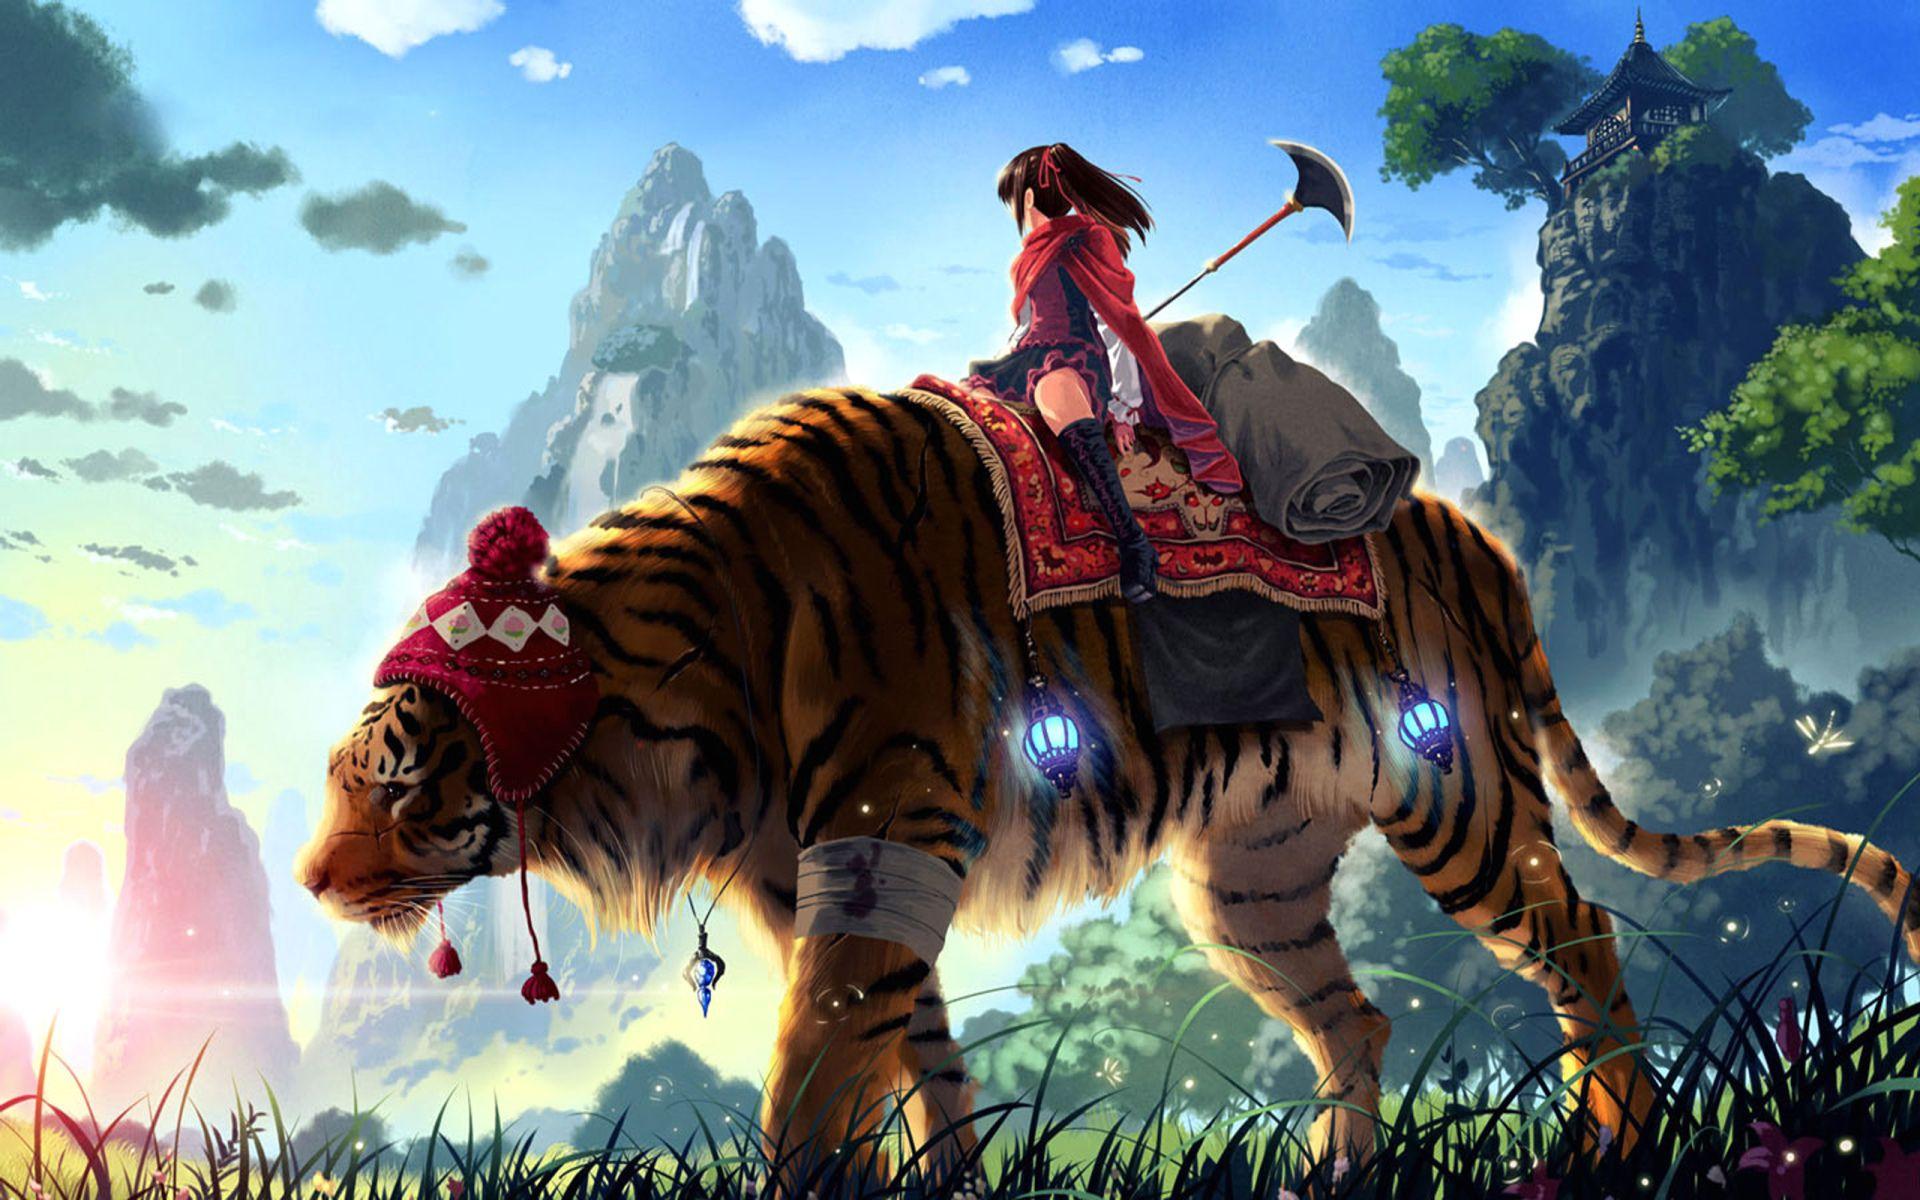 Anime Original Girl Tiger Anime Wallpaper Hd Anime Wallpapers Tiger Wallpaper Anime Wallpaper